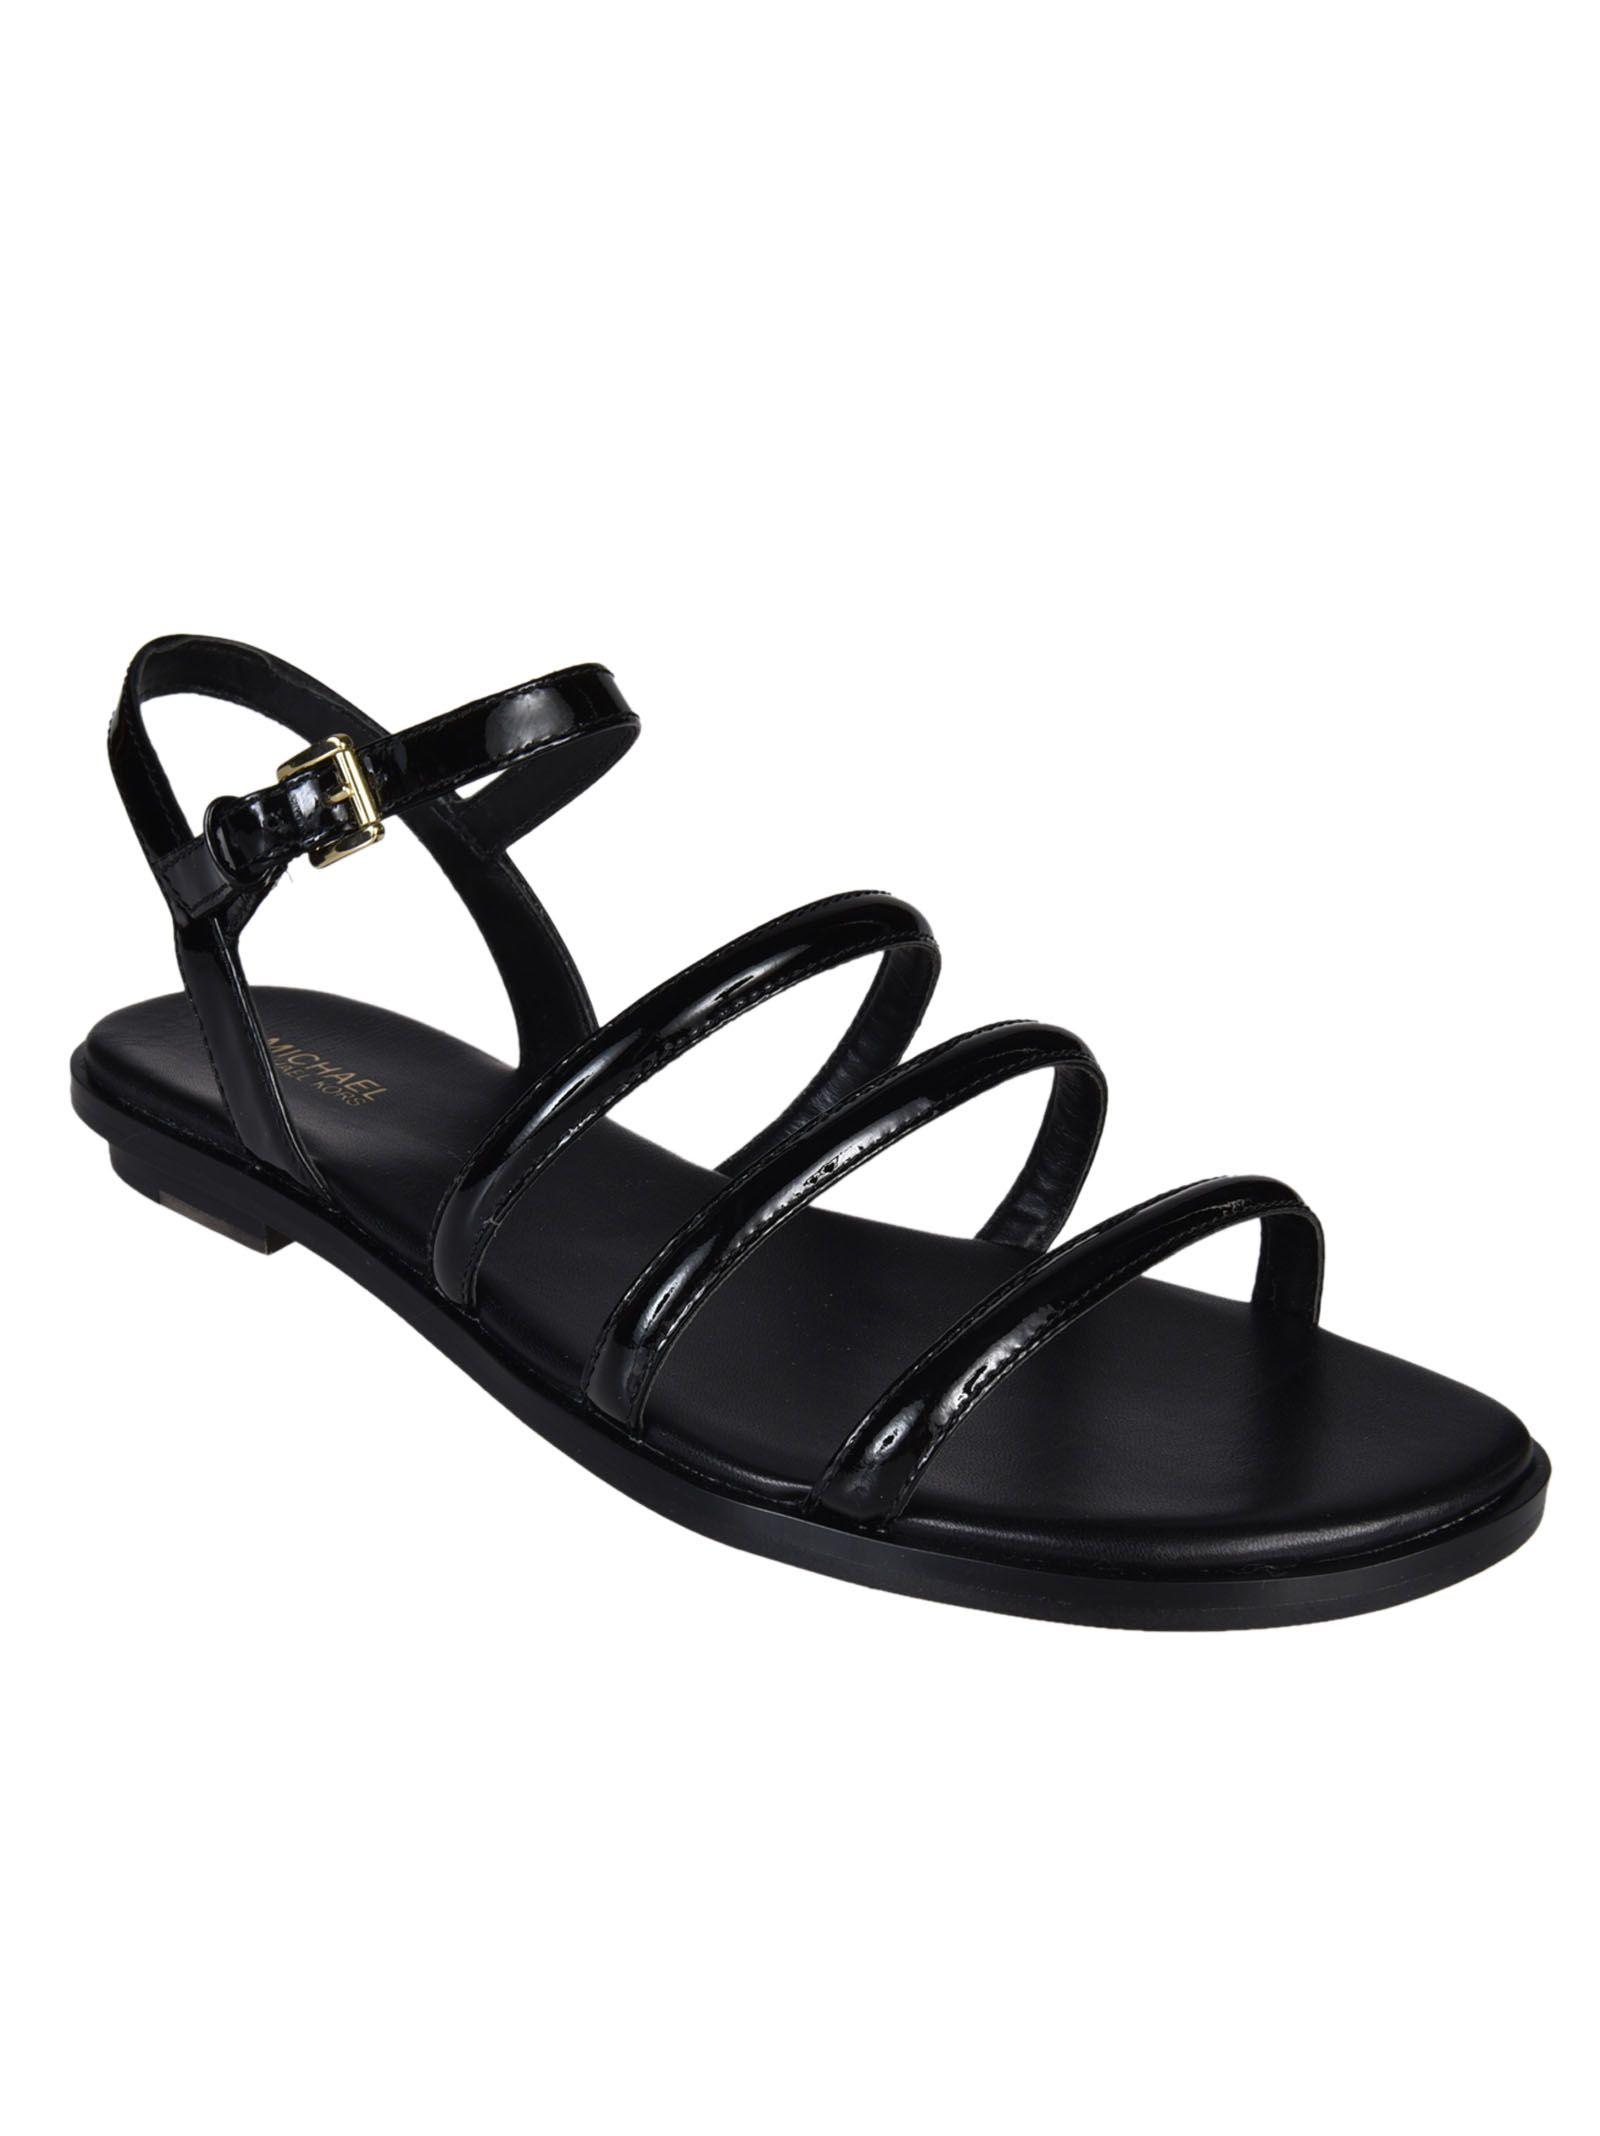 9394c292f70a MICHAEL Michael Kors MICHAEL Michael Kors Nantucket Flat Sandals ...